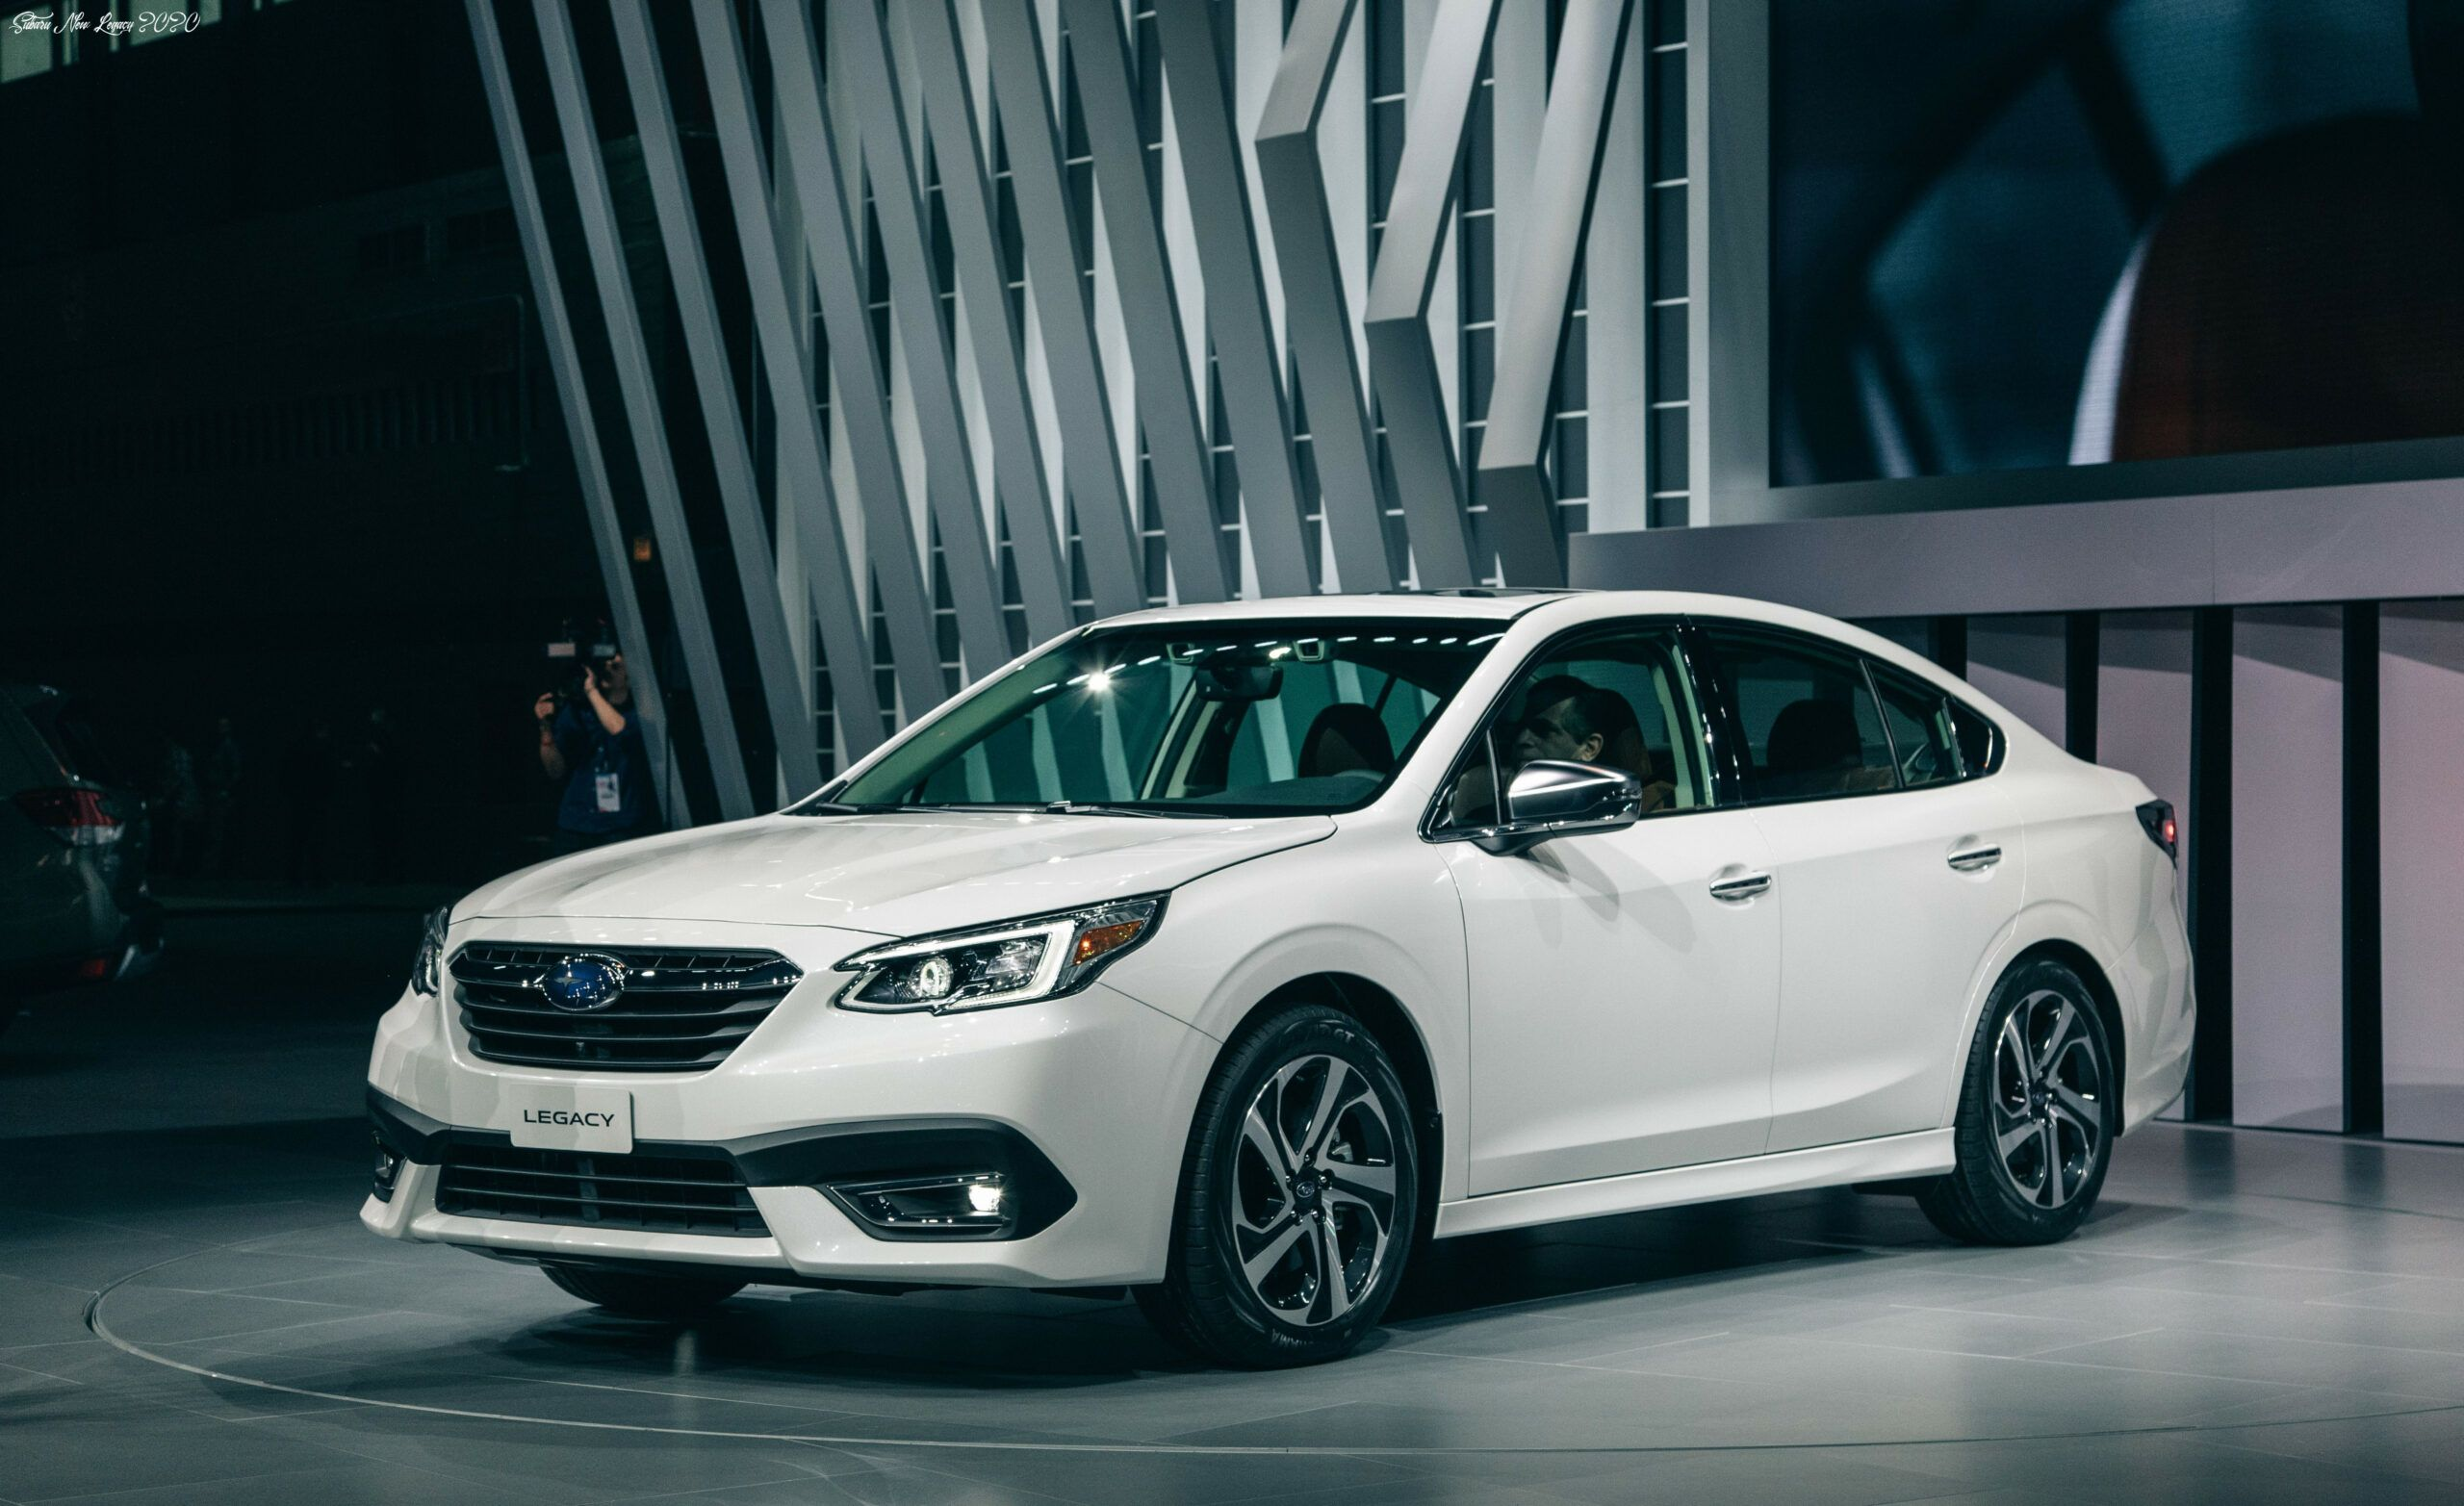 Subaru New Legacy 2020 Concept In 2020 Subaru Legacy Subaru Legacy Gt Legacy Gt